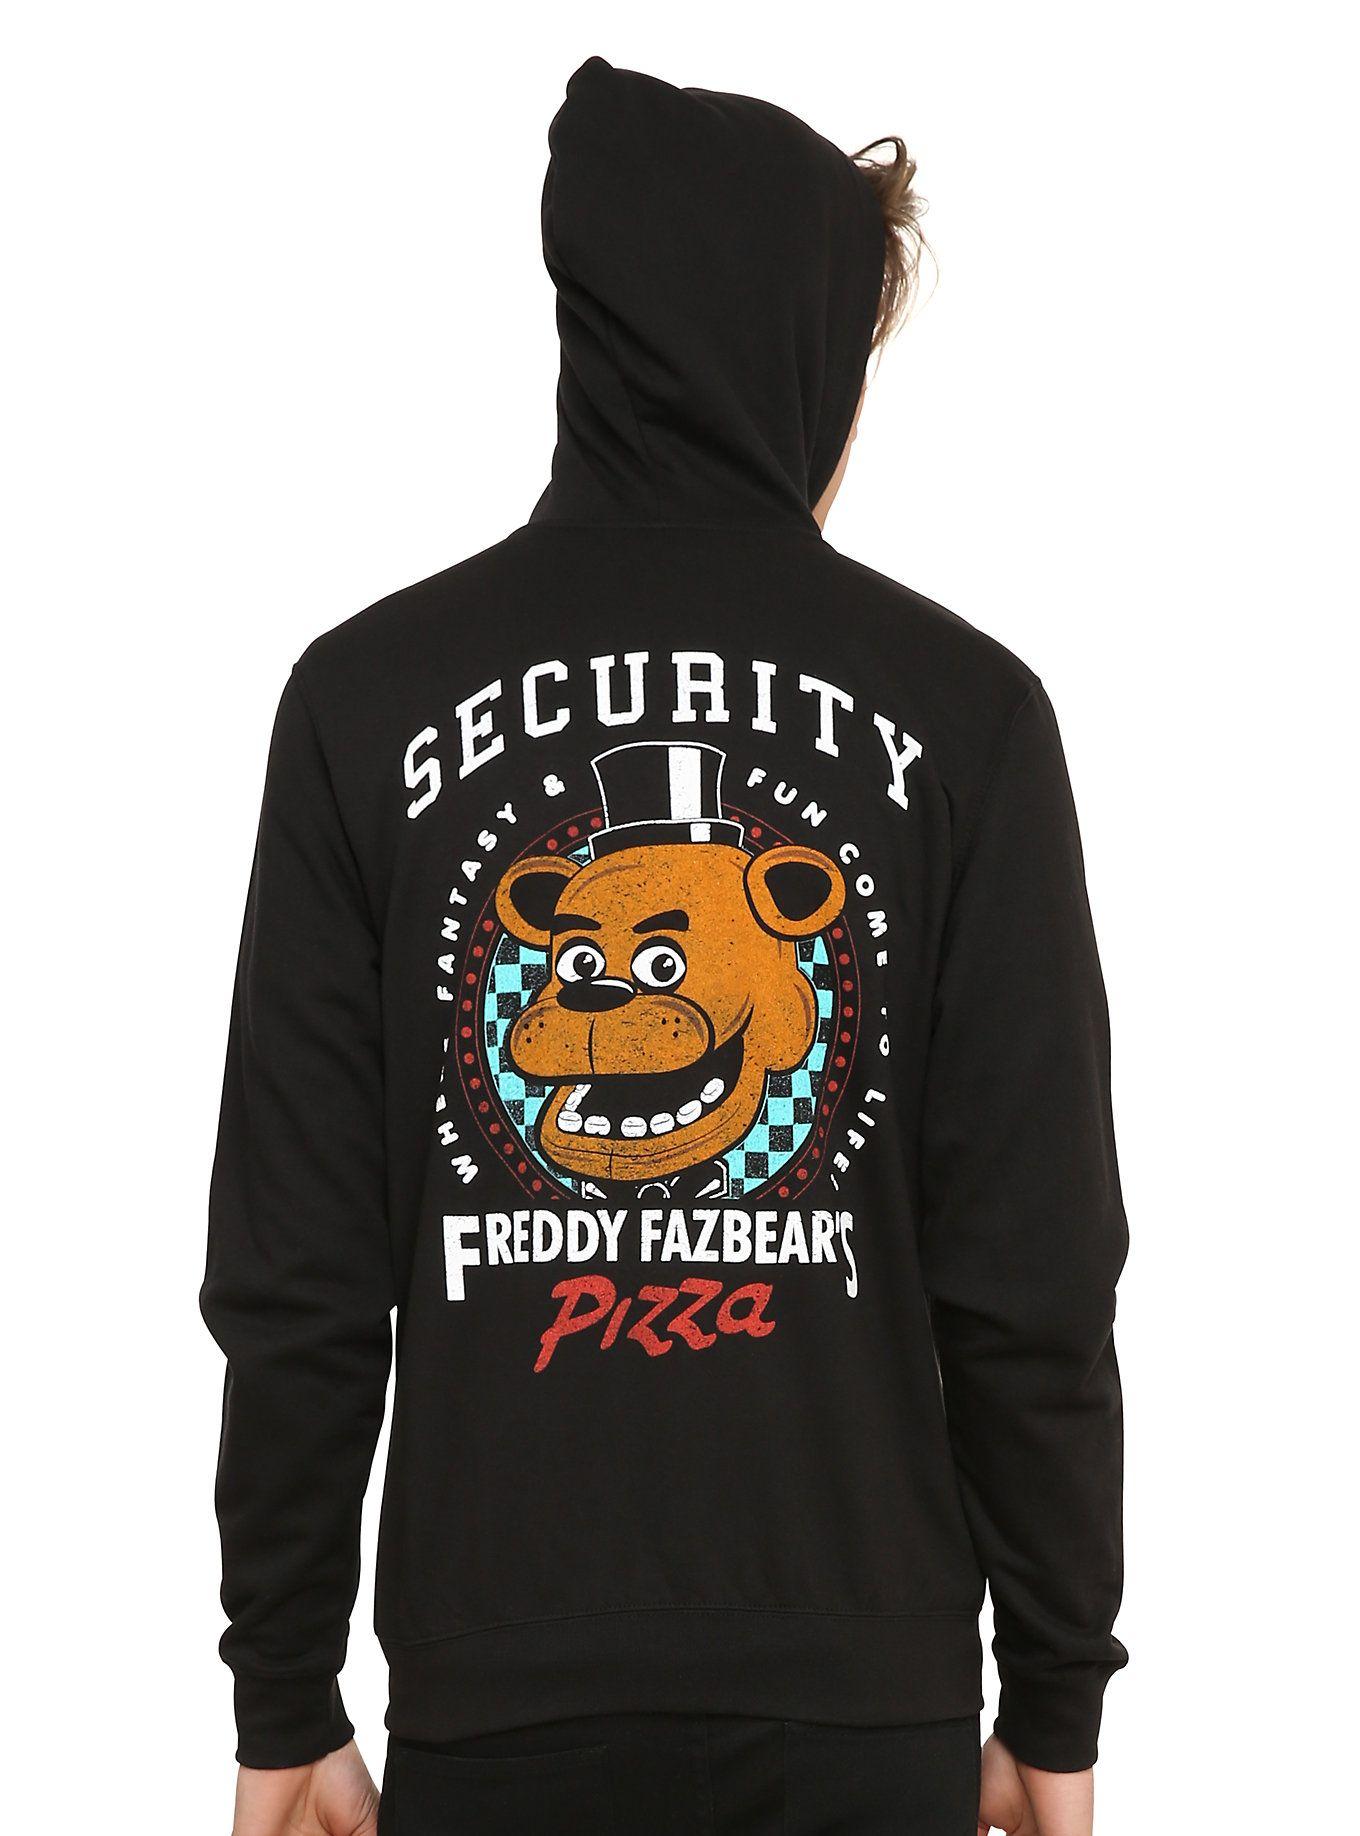 Five Freddy's Hoodie At Freddy Pizza Fazbear's Nights Security qzMpVGSU